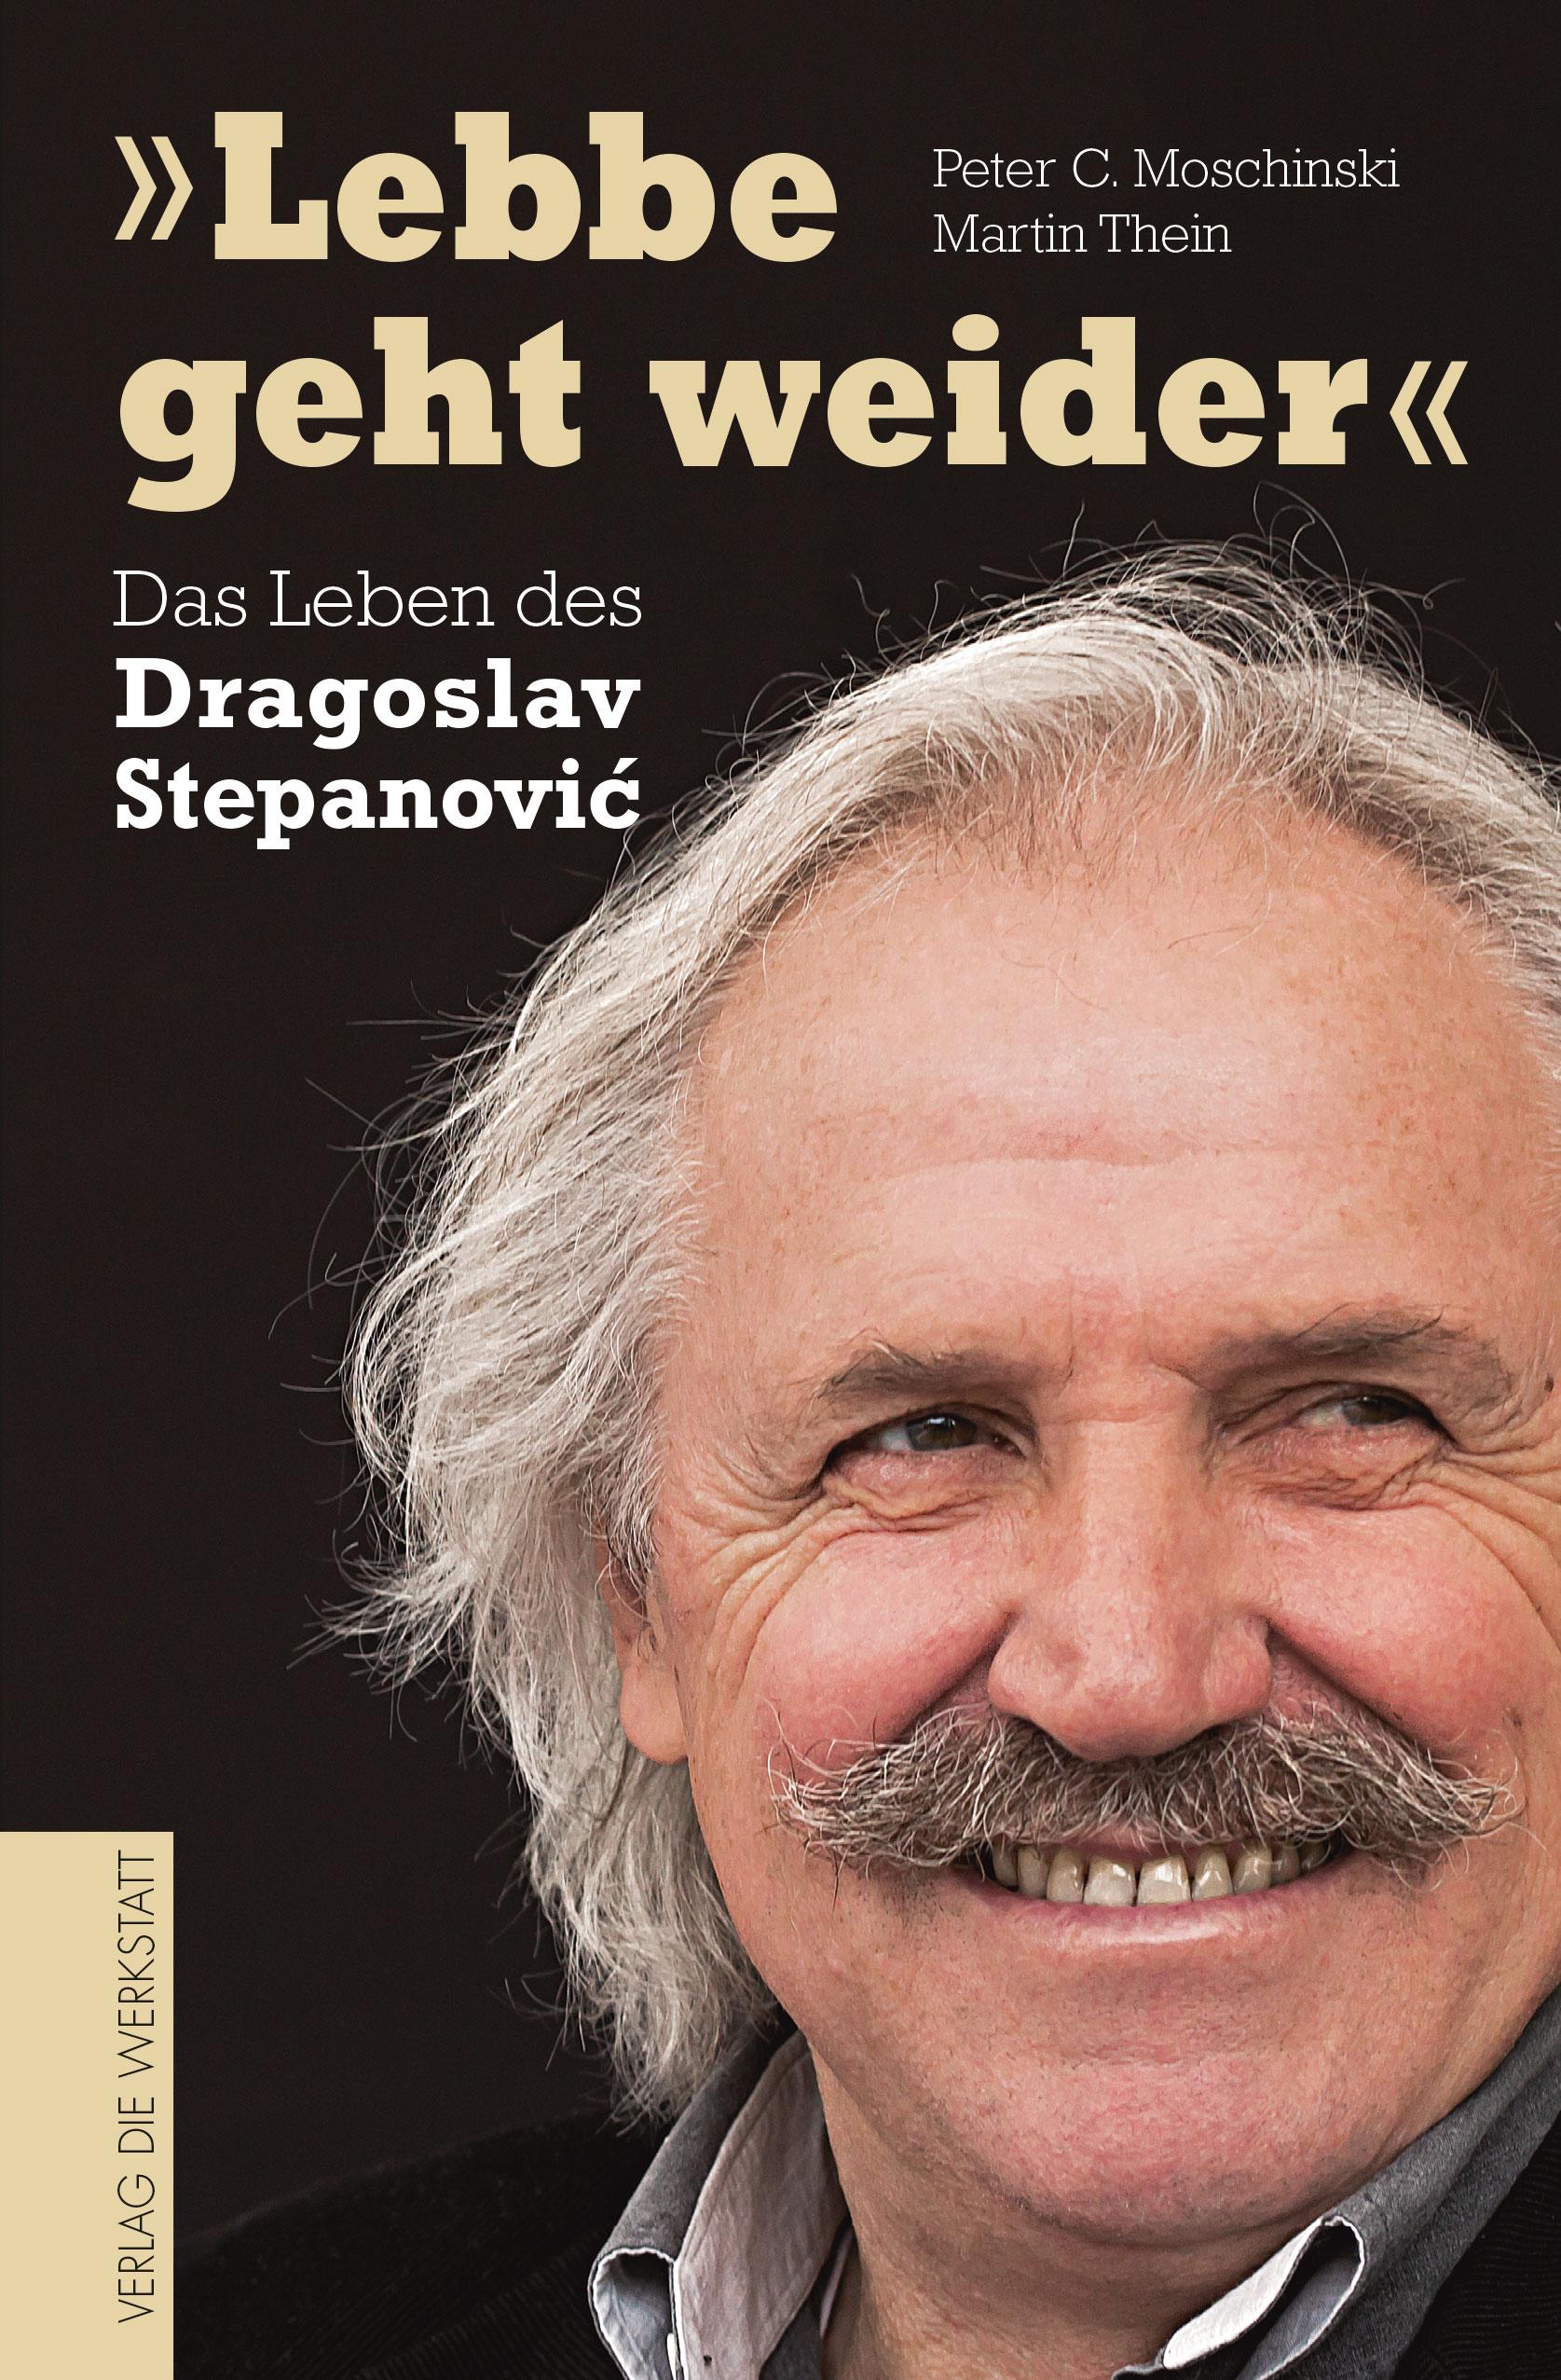 Lebbe geht weider: Das Leben des Dragoslav Stepanovic - Peter C. Moschinski